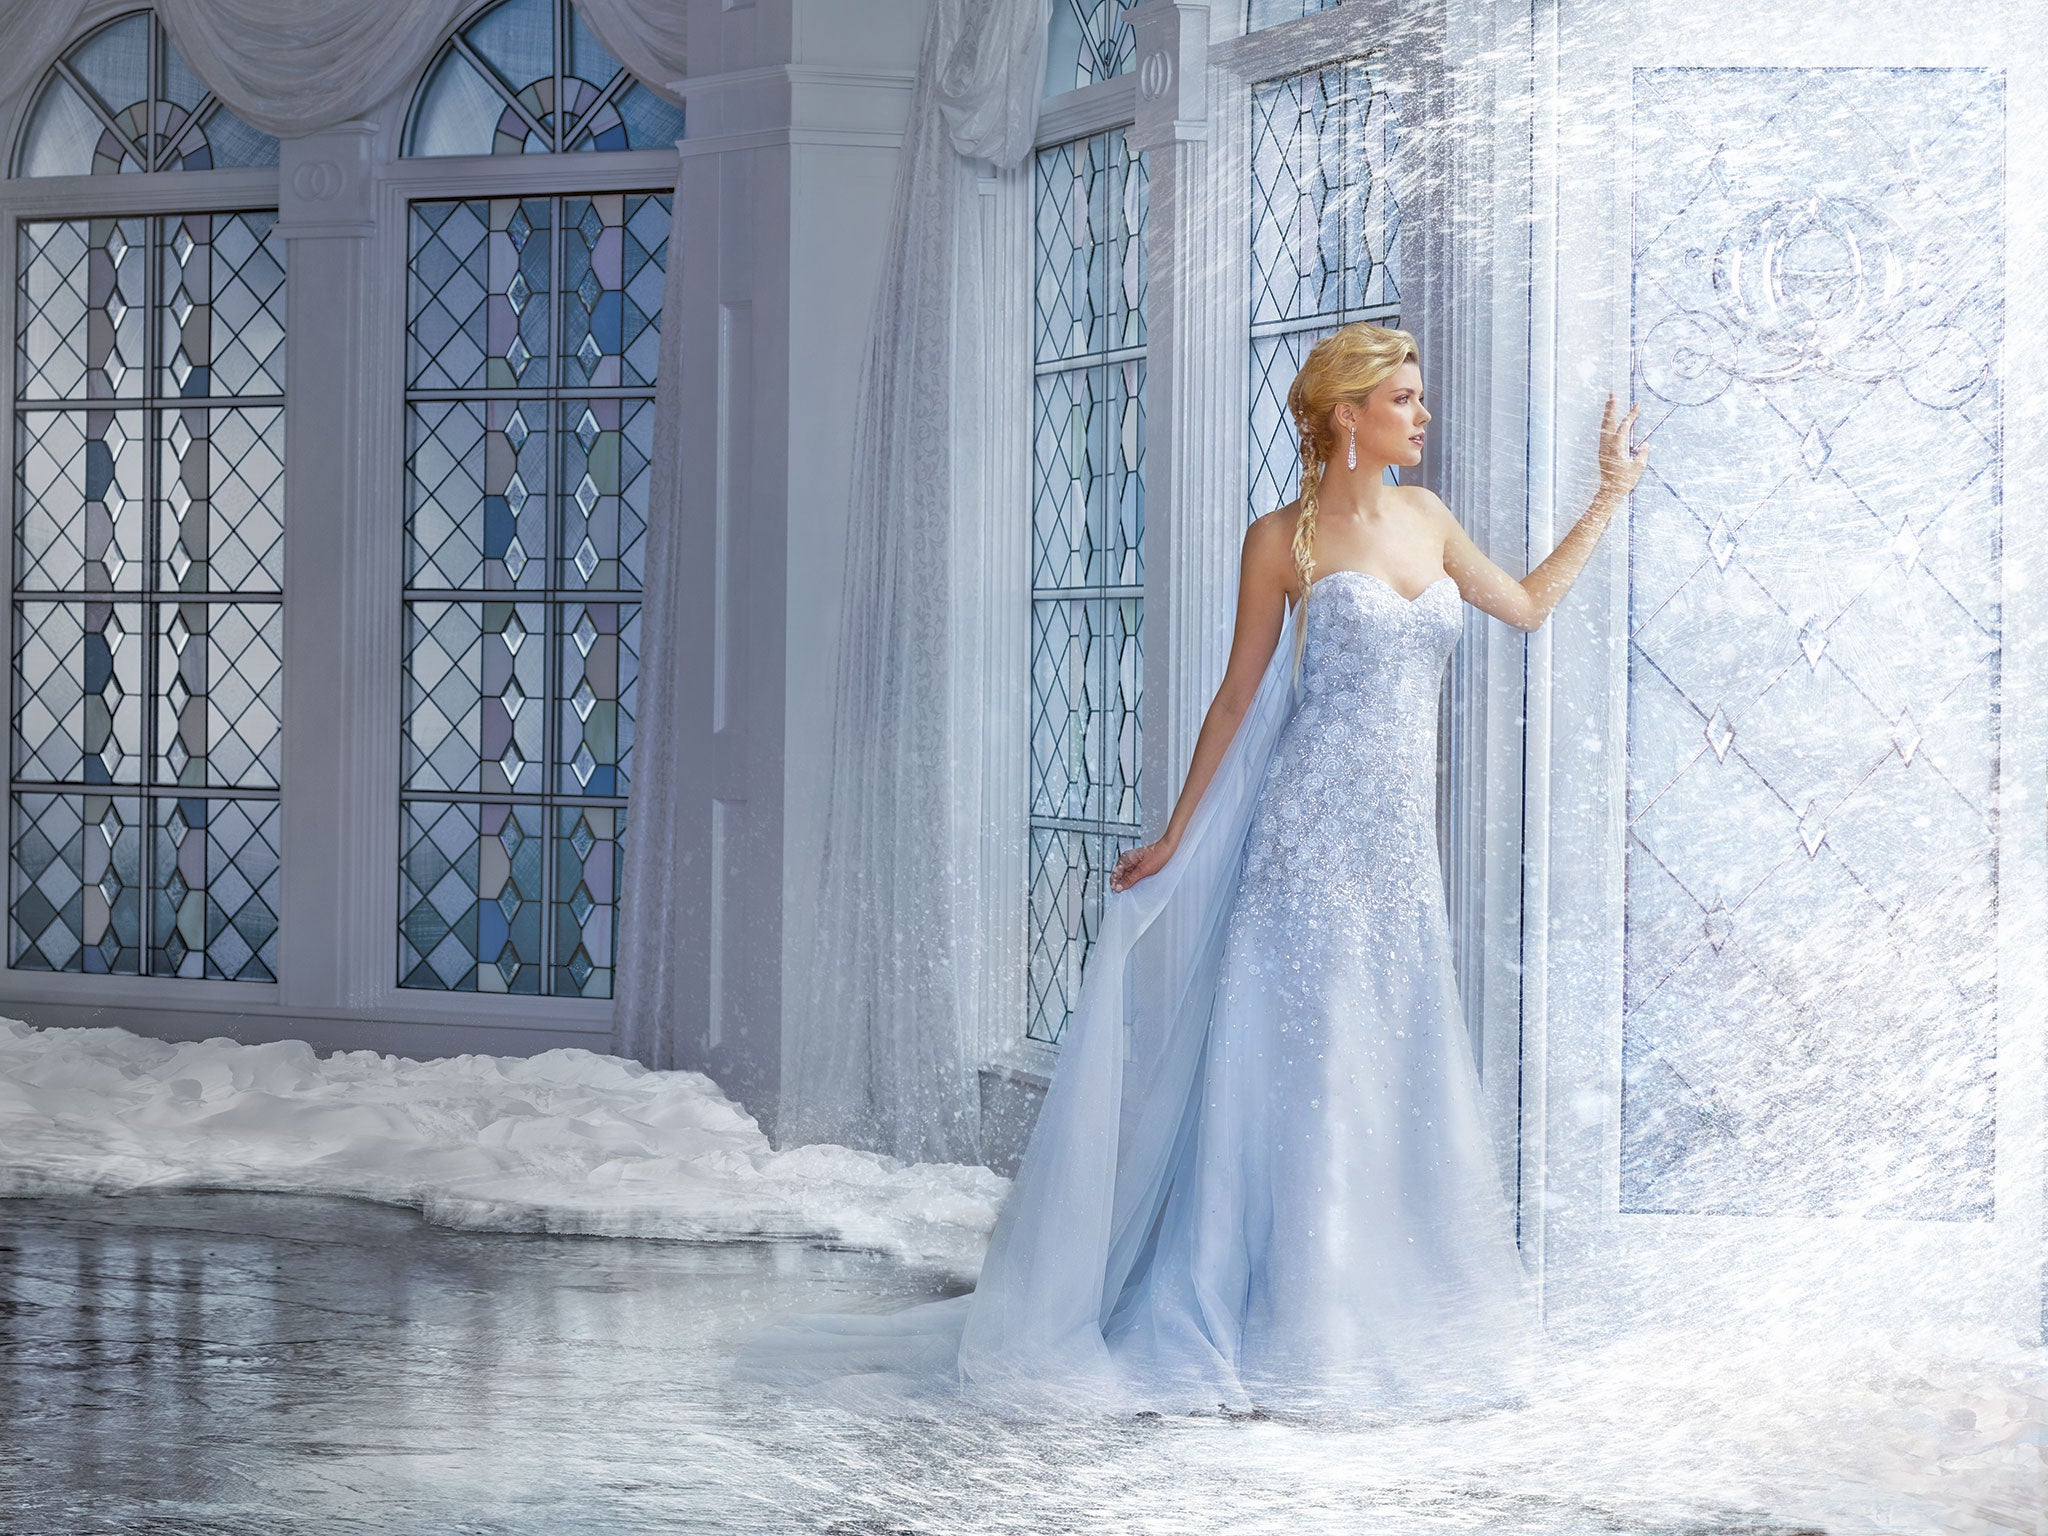 Look - Elsa Frozen wedding dress? Love it video